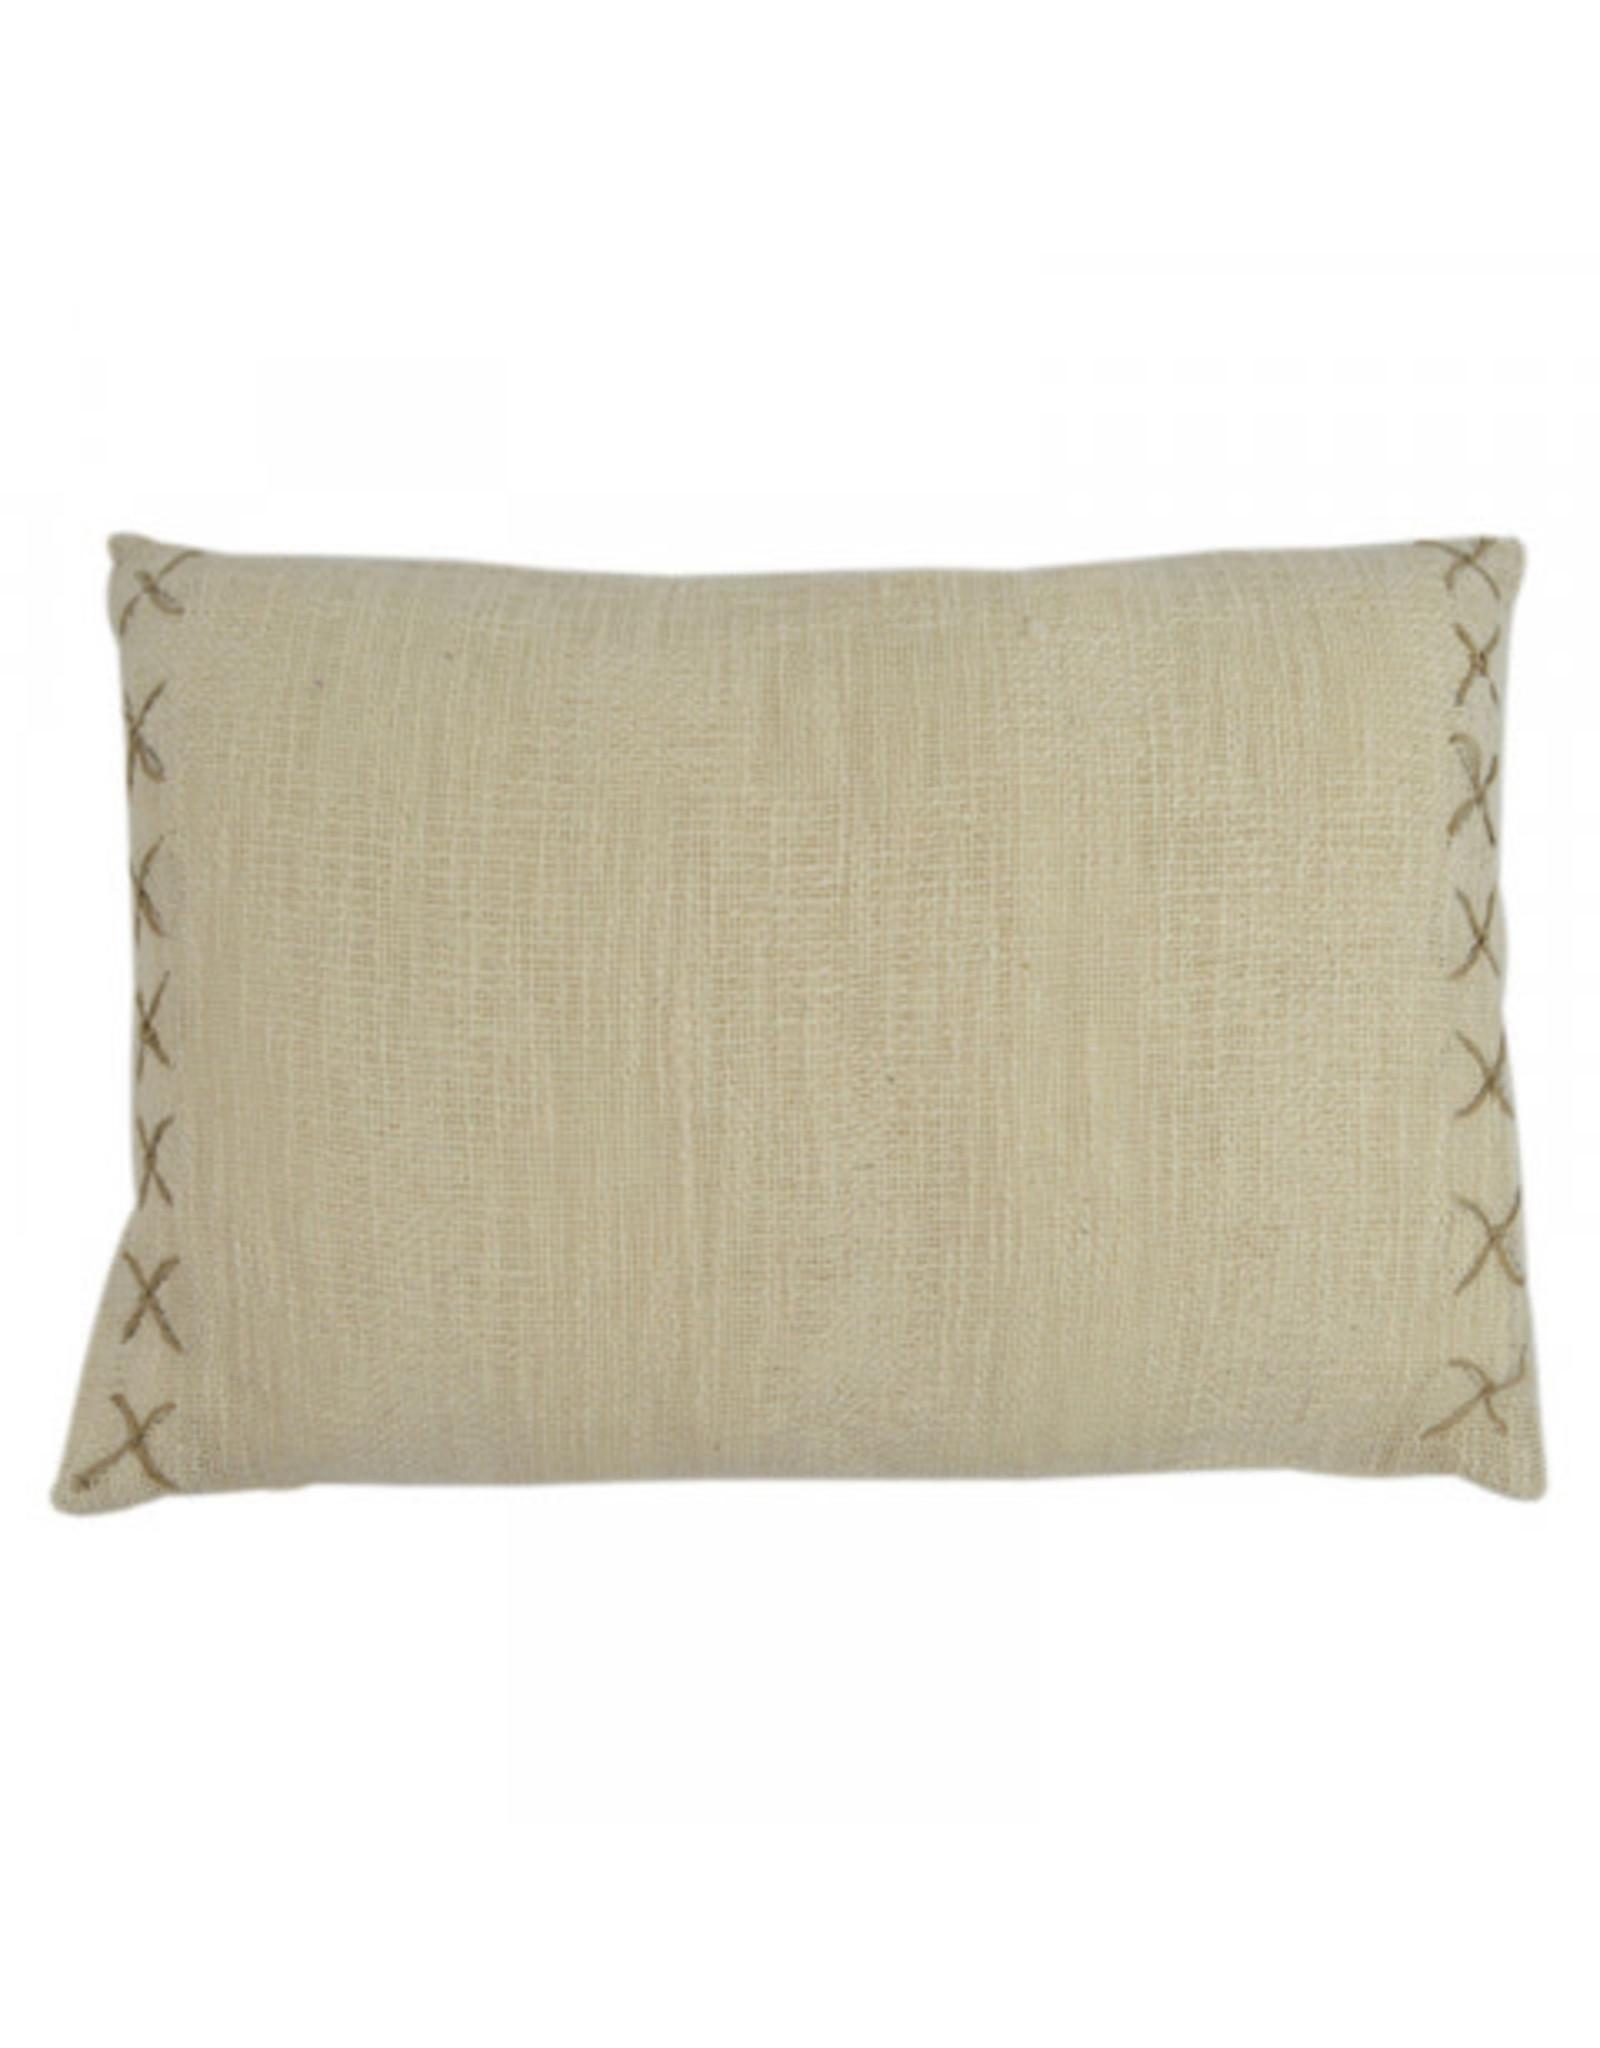 Cushion Stitch Cotton 40x60cm